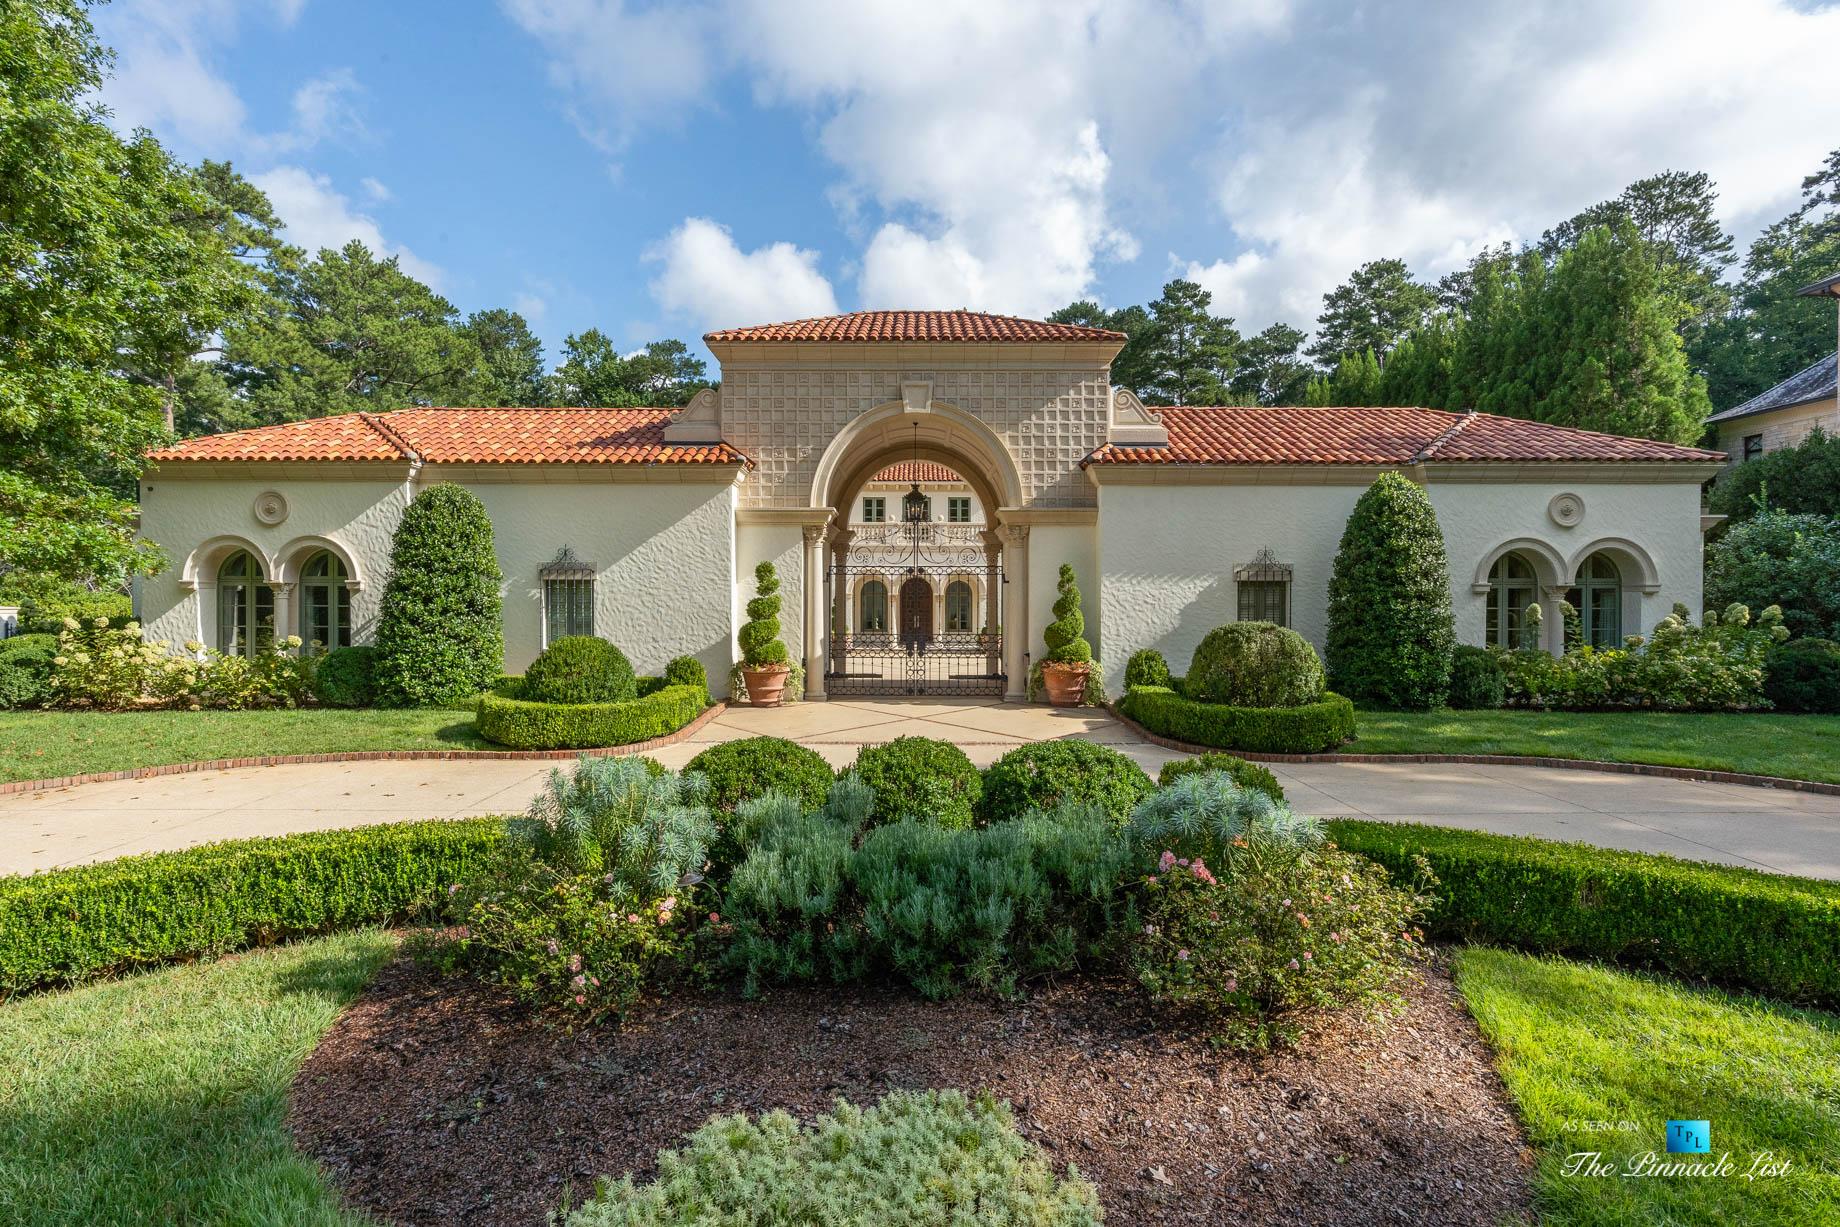 439 Blackland Rd NW, Atlanta, GA, USA - Front Yard Entrance Garden View - Luxury Real Estate - Berndsen Custom Mansion Home